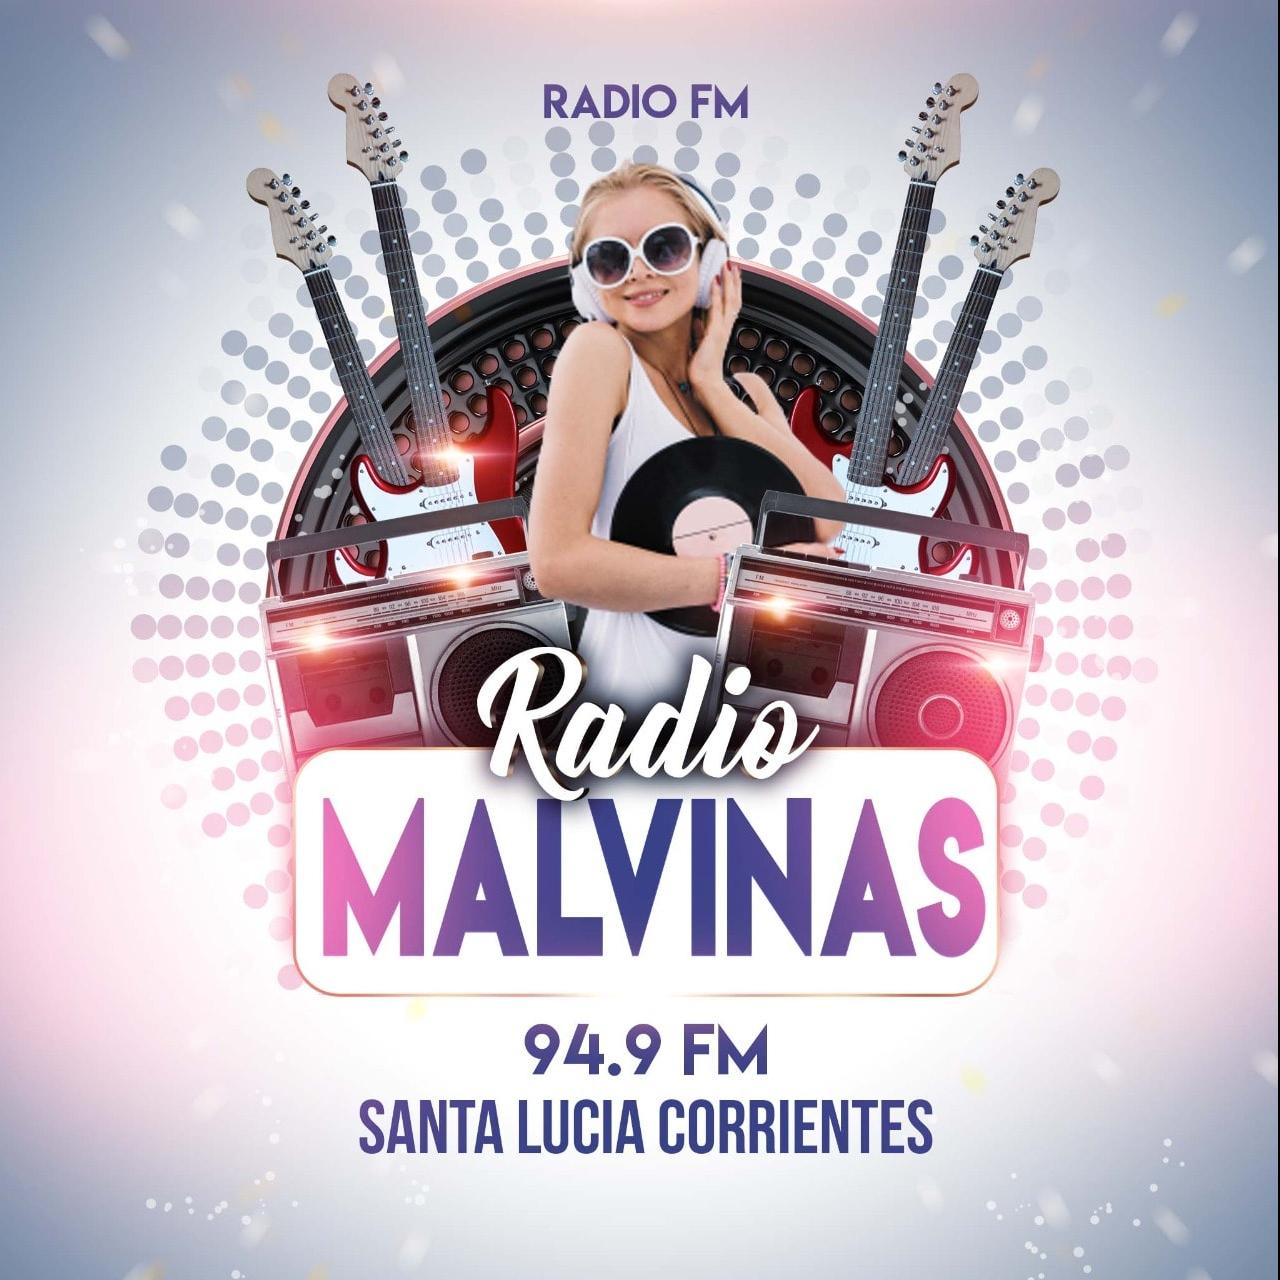 FM MALVINAS 94.9 MHZ